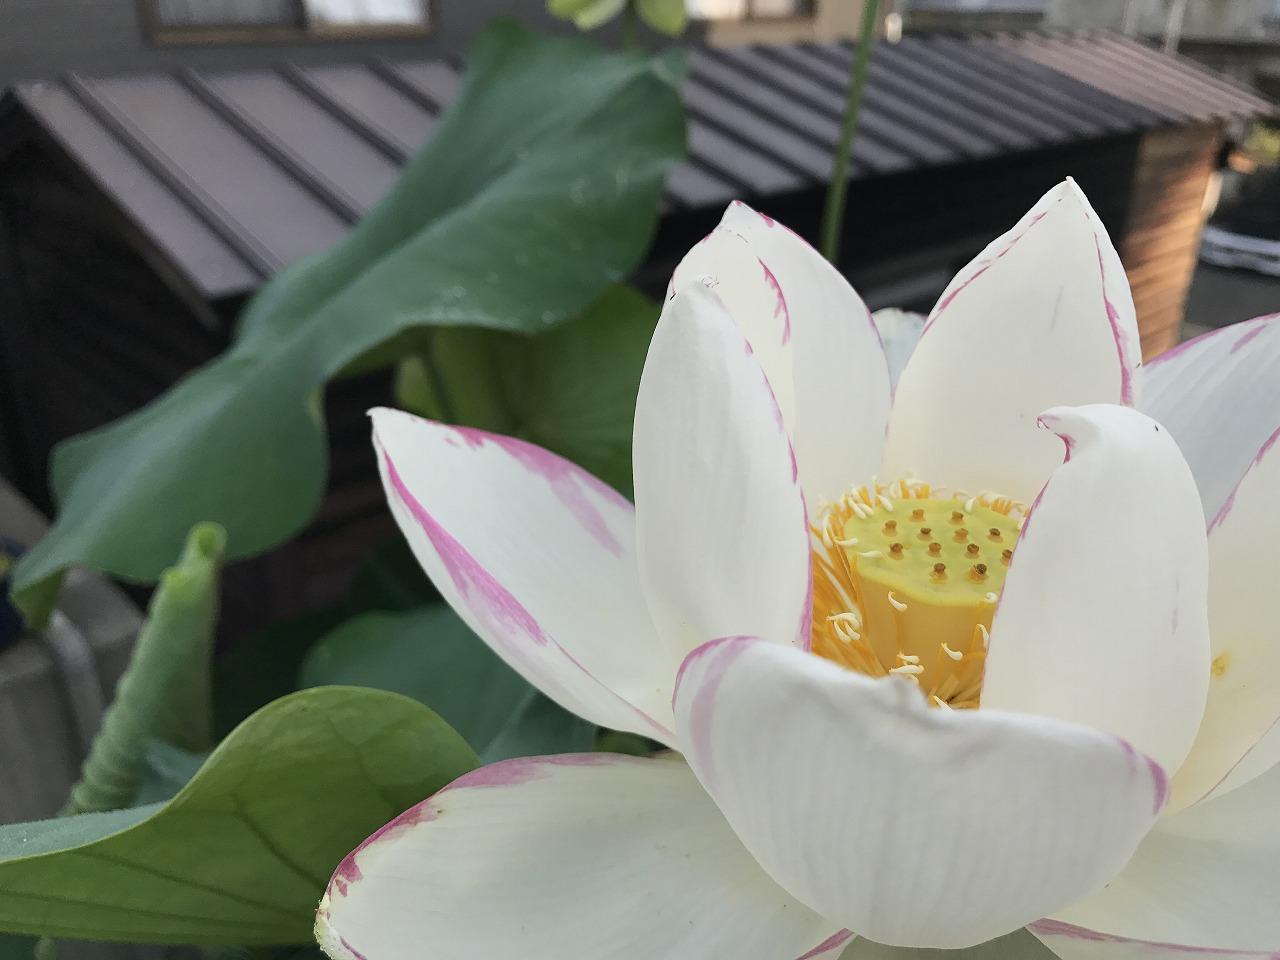 20170714-Lotus_Ittenshikai-I02.jpg